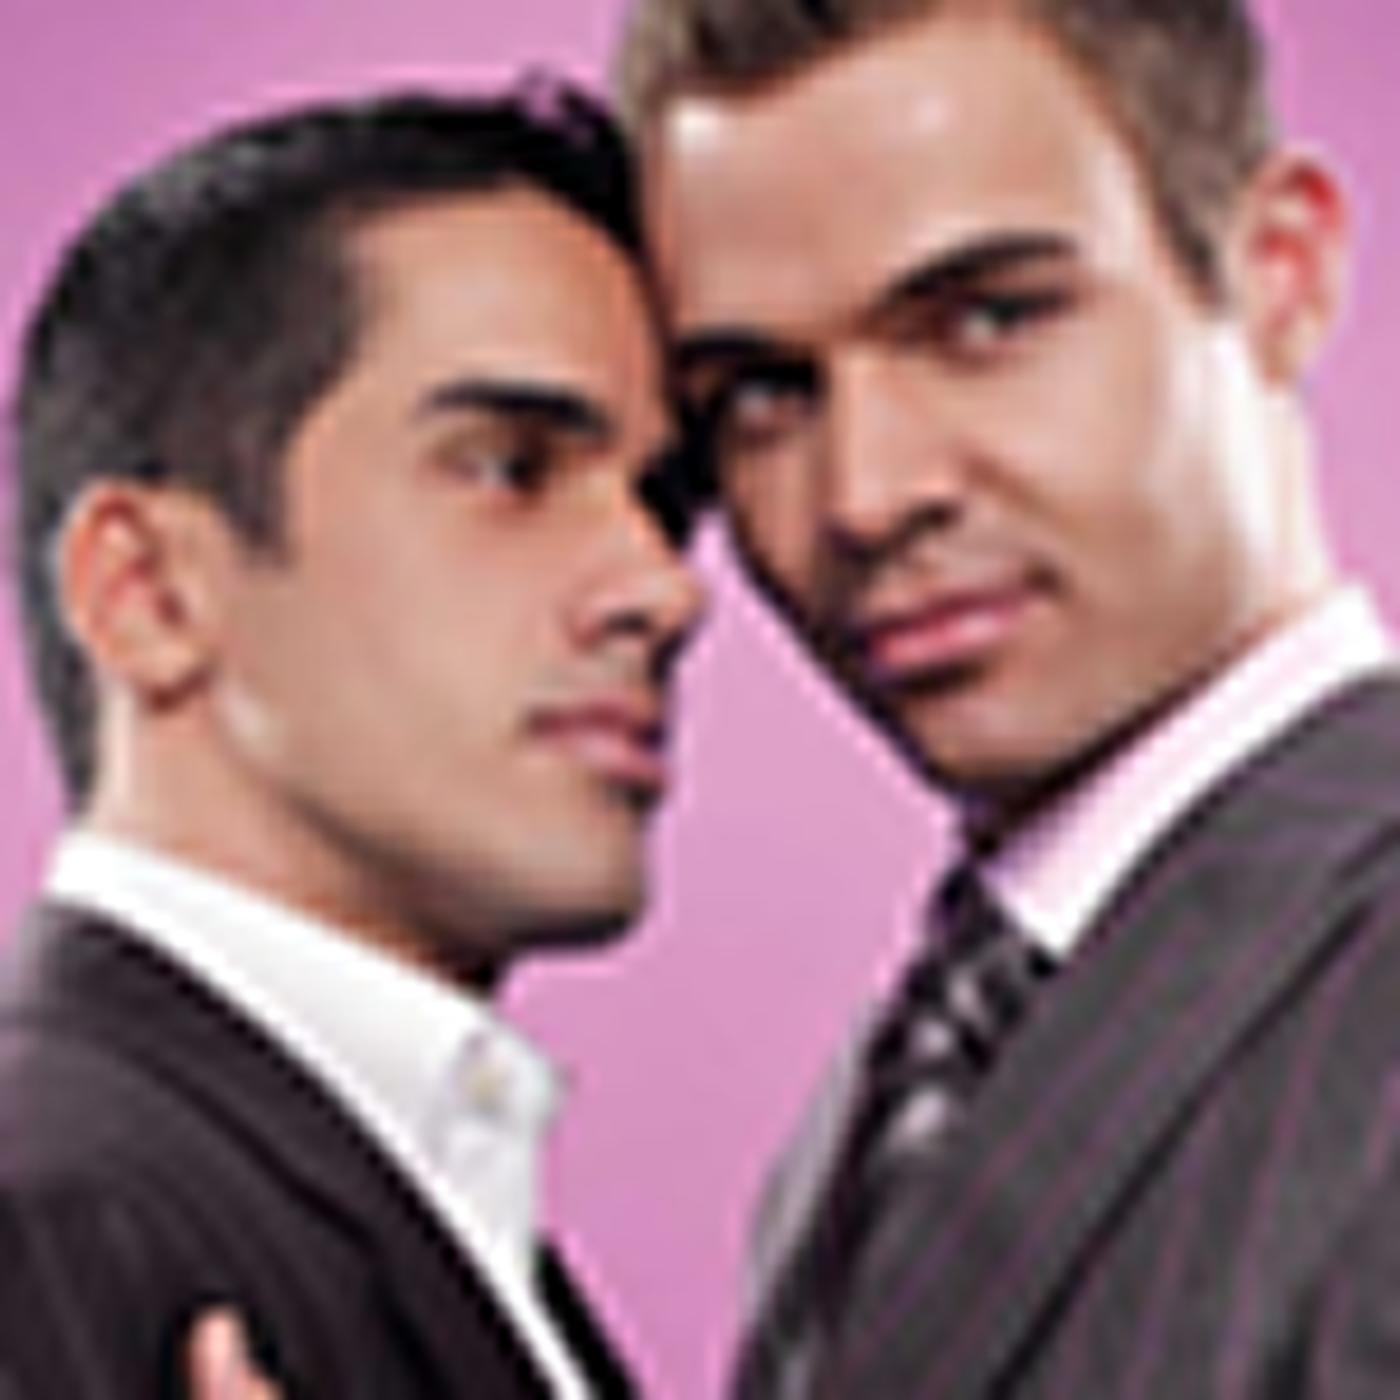 сайт знакомств в питере без регистрации онлайн